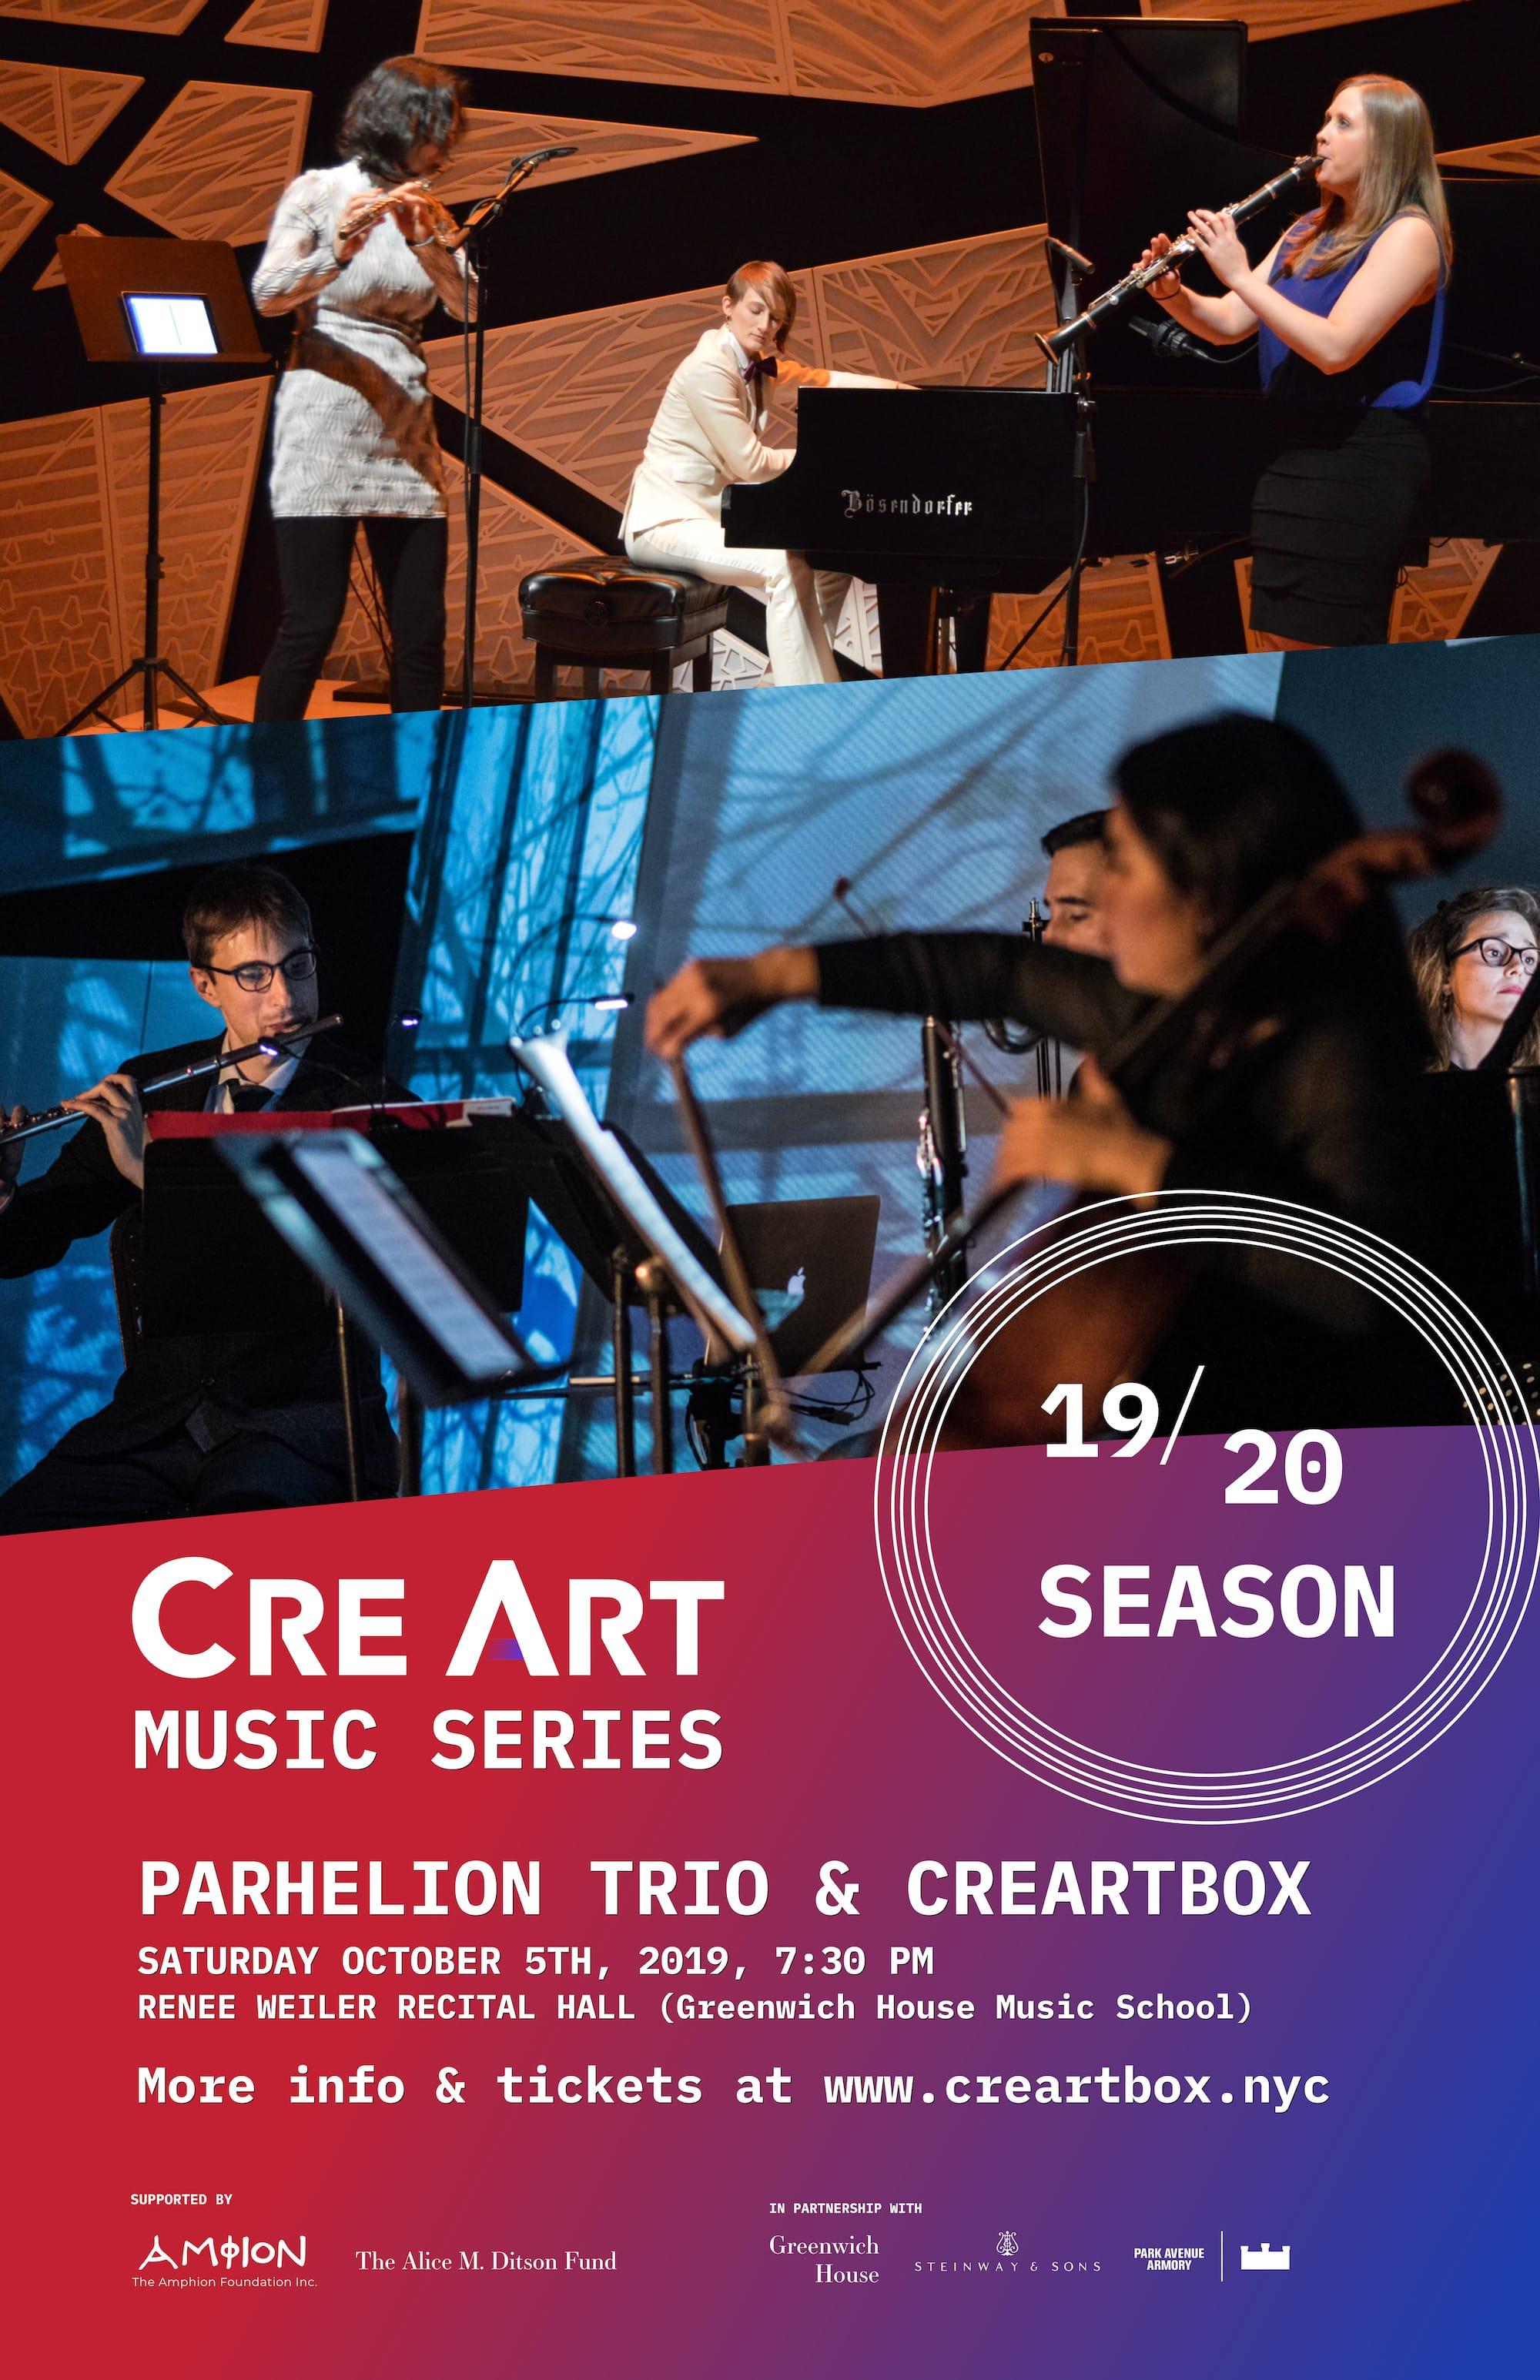 2019.10.05_CreArt_Music_Series_opening_concert.jpg